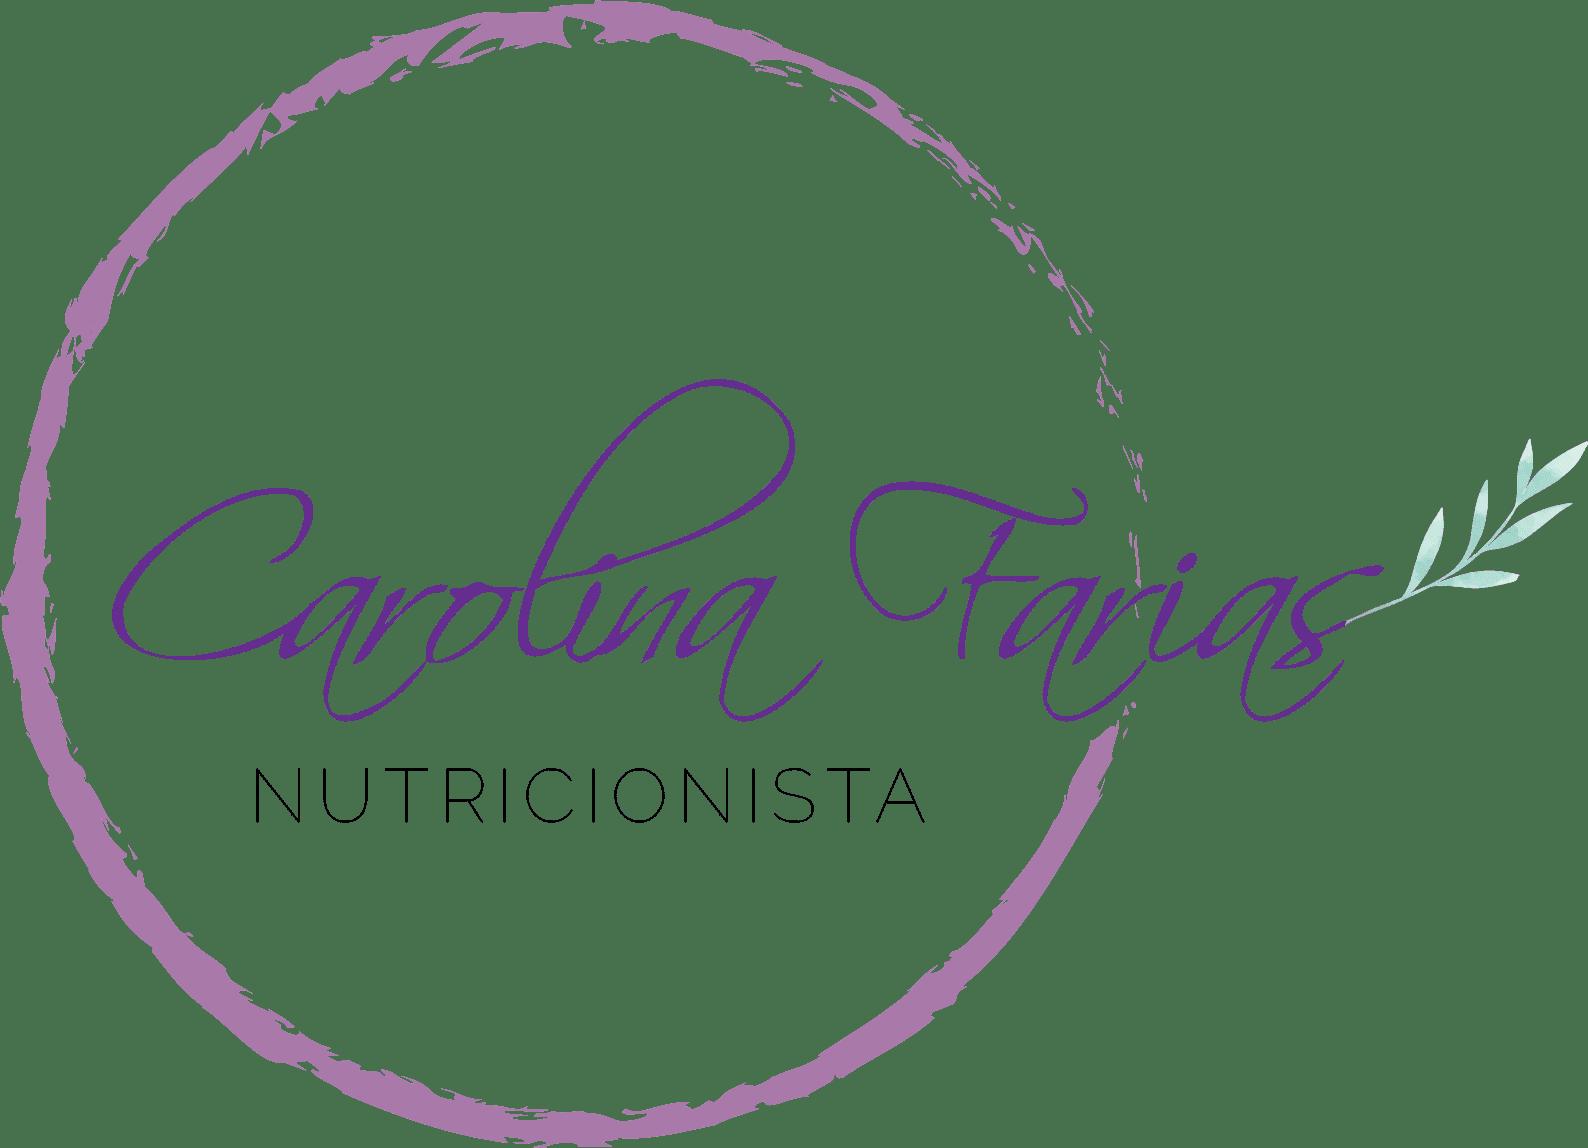 Logo oficial Carolina Farias